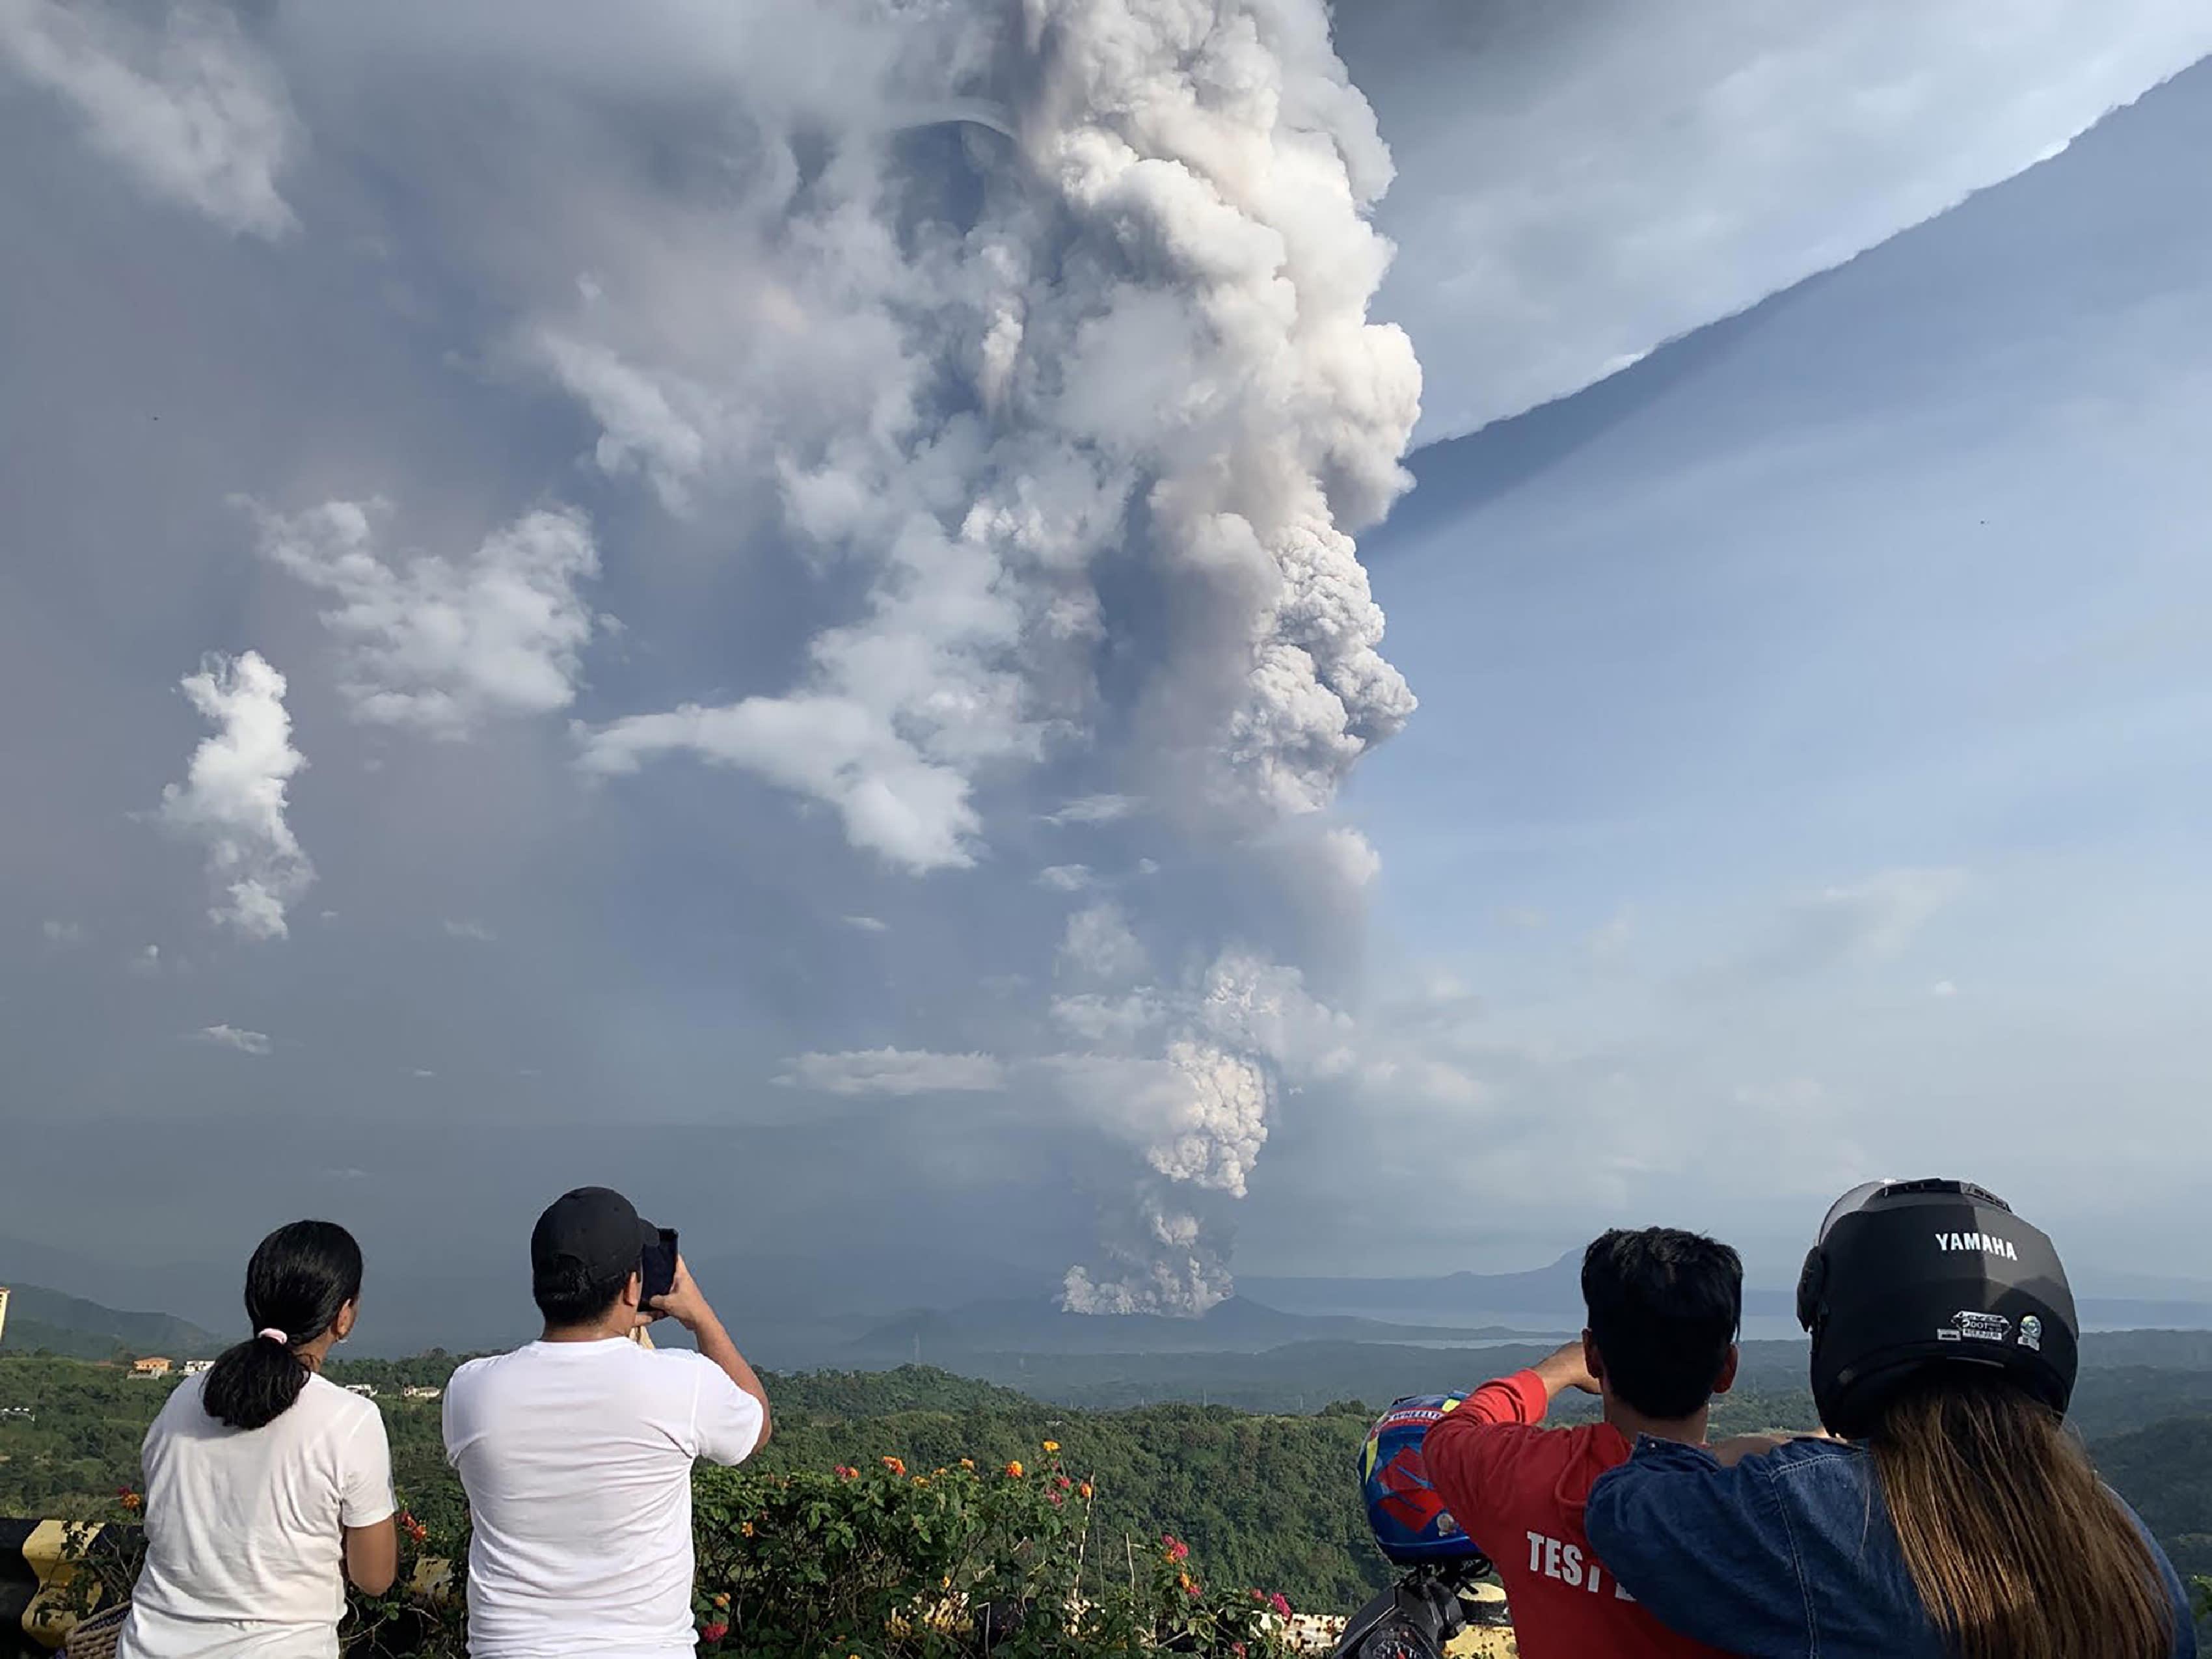 Philippines suspends Manila airport flights as volcano spews ash